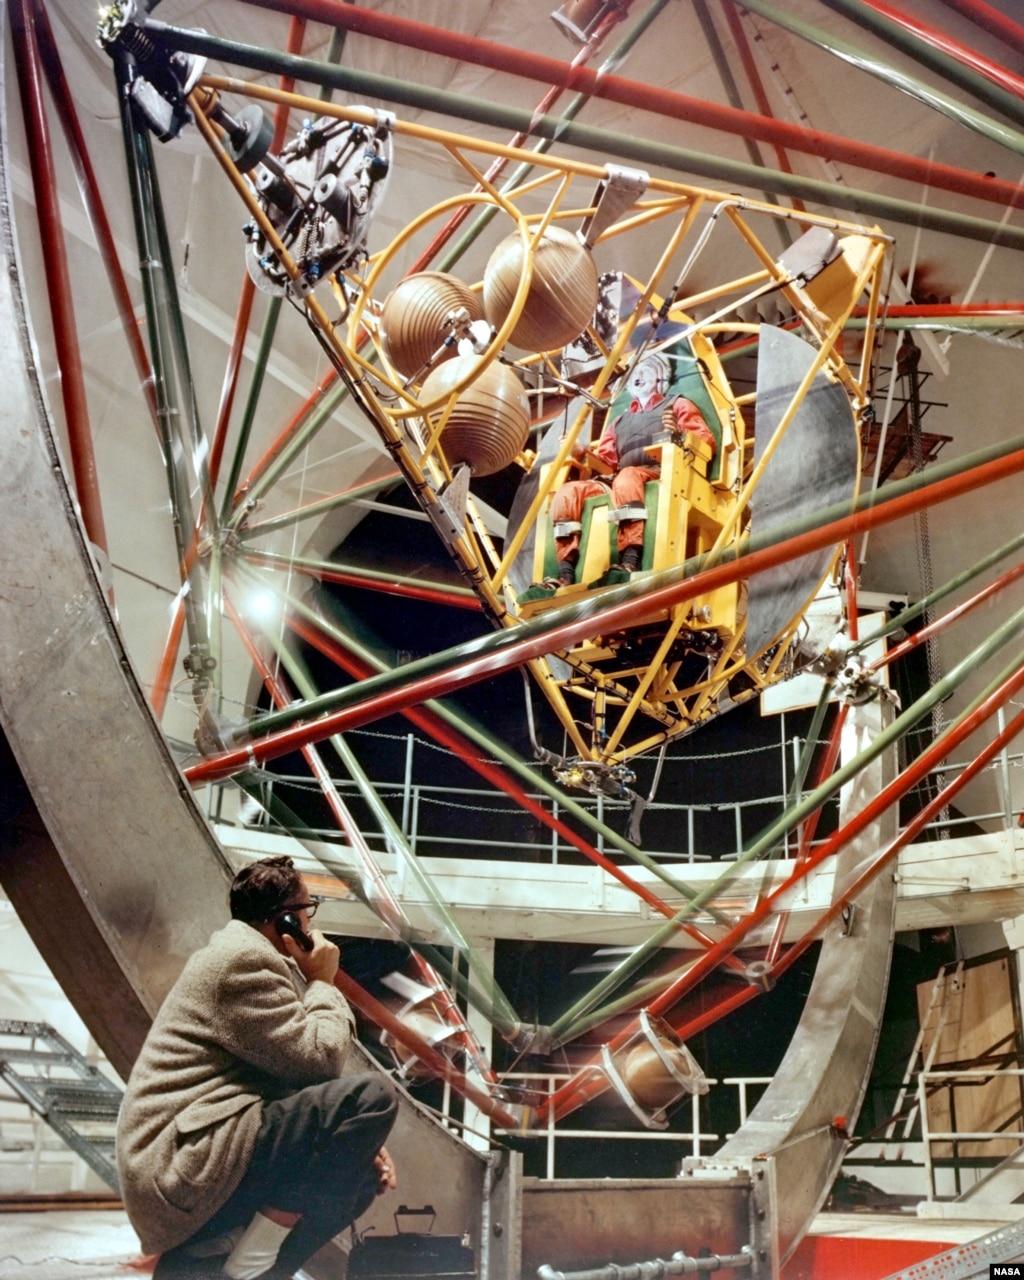 Project Mercury: The American Space Program Begins